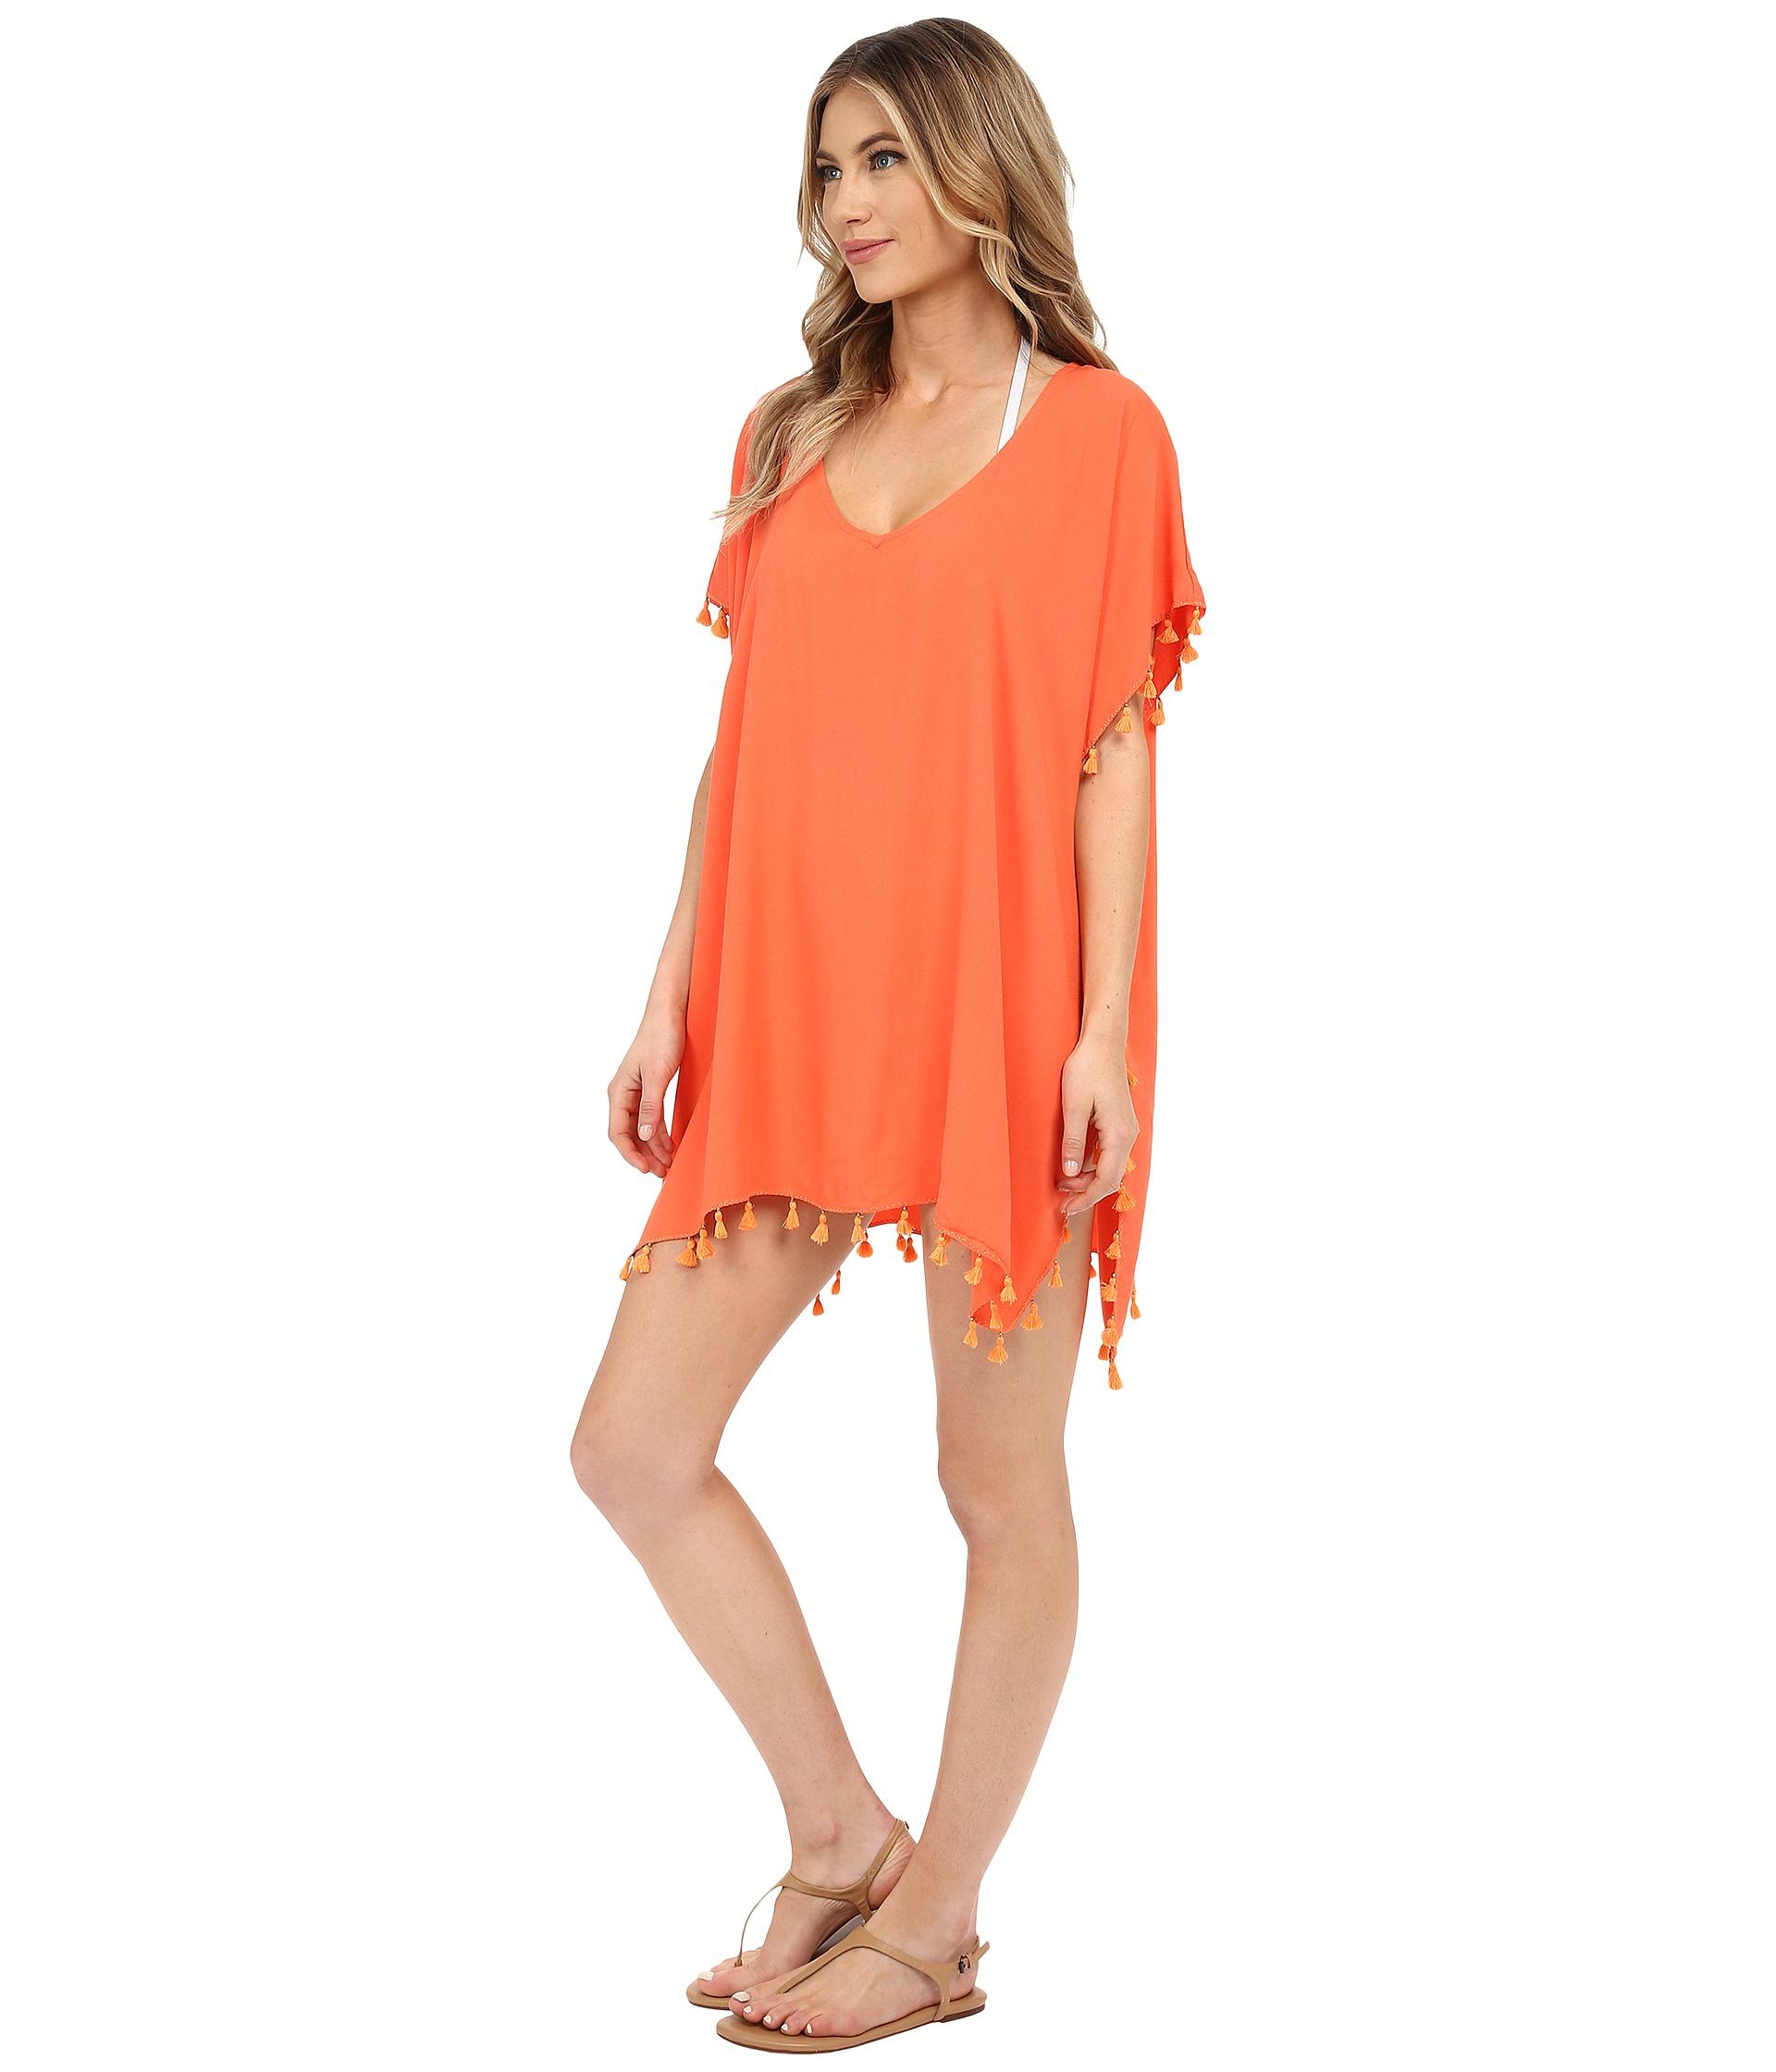 901a8318cb33e Lyst - Seafolly Bling Beach Kaftan Cover-up in Orange